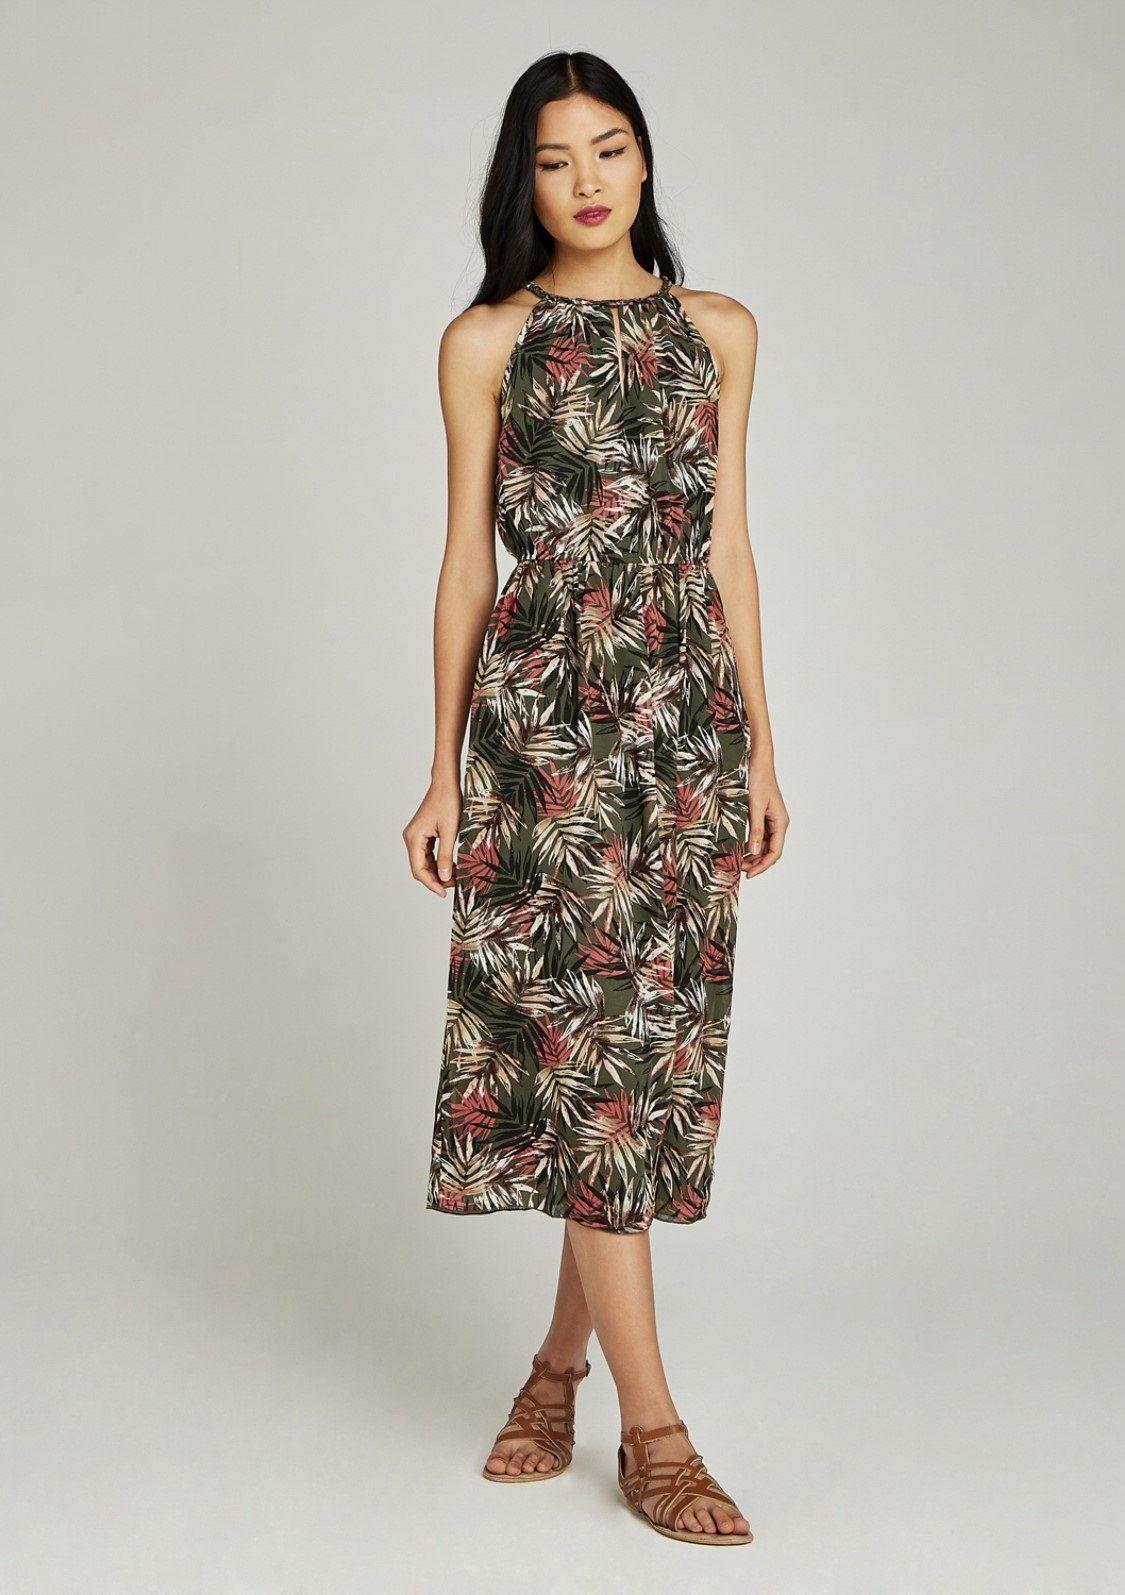 Image of Apricot Chiffonkleid »Tropical Palm Tie Neck Midi Dress«